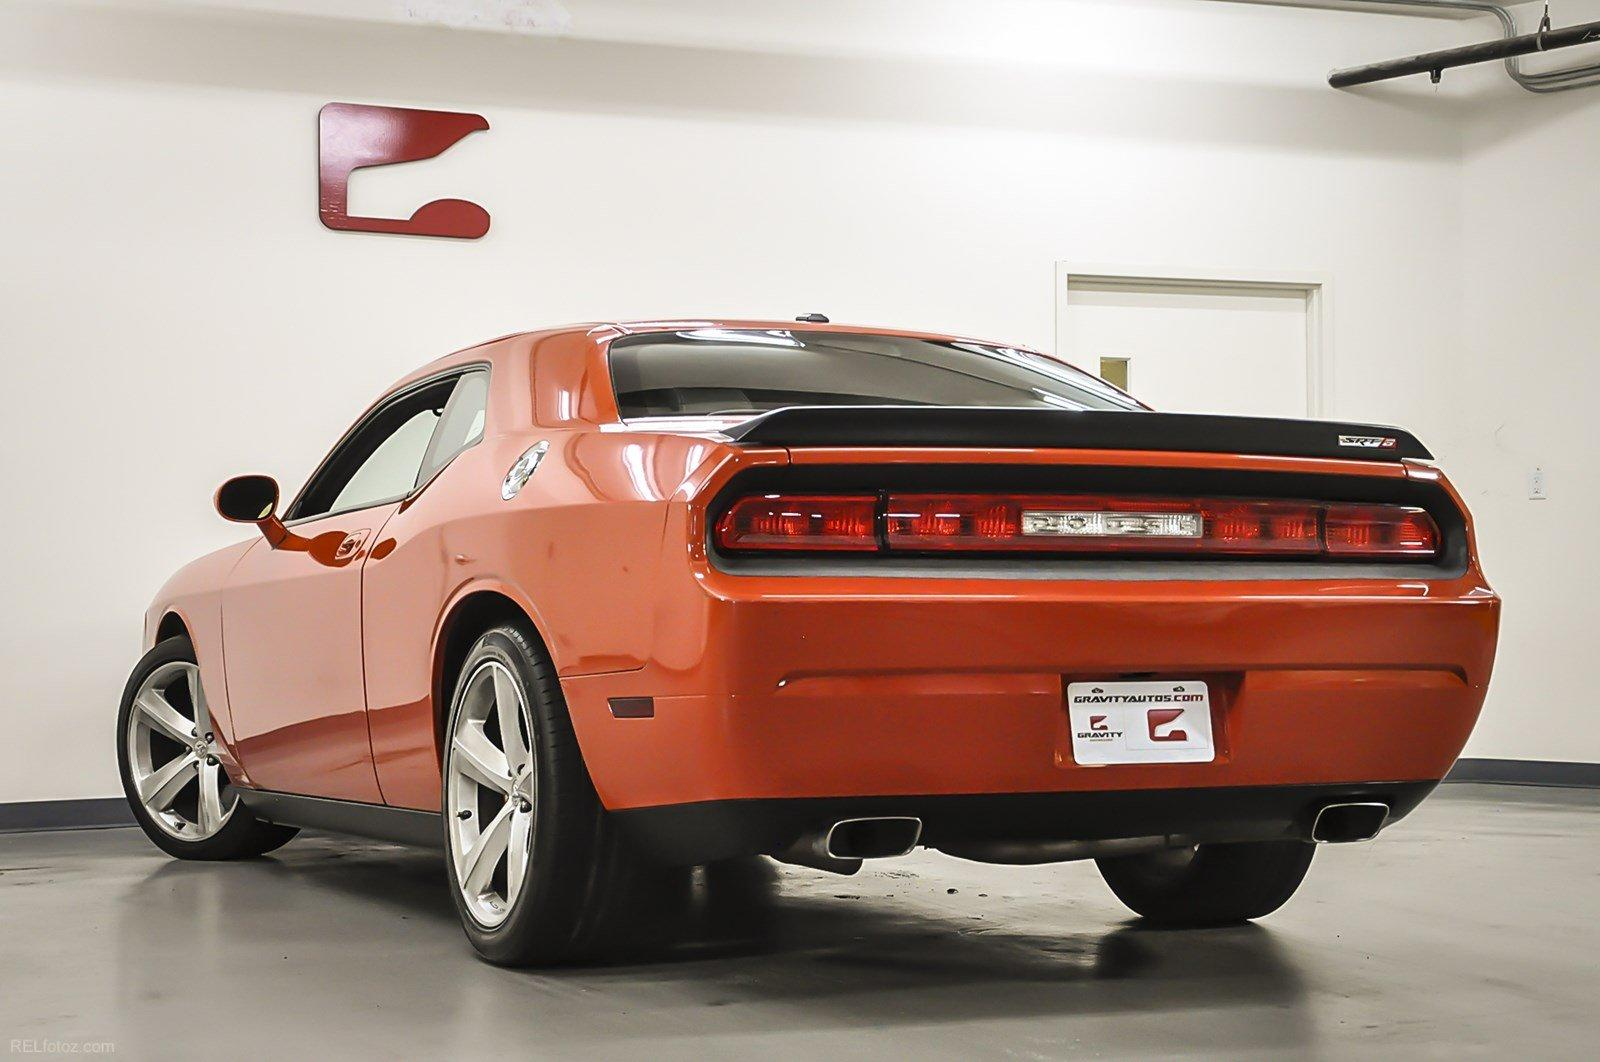 Gravity Autos Marietta >> 2009 Dodge Challenger SRT8 Stock # 579892 for sale near ...